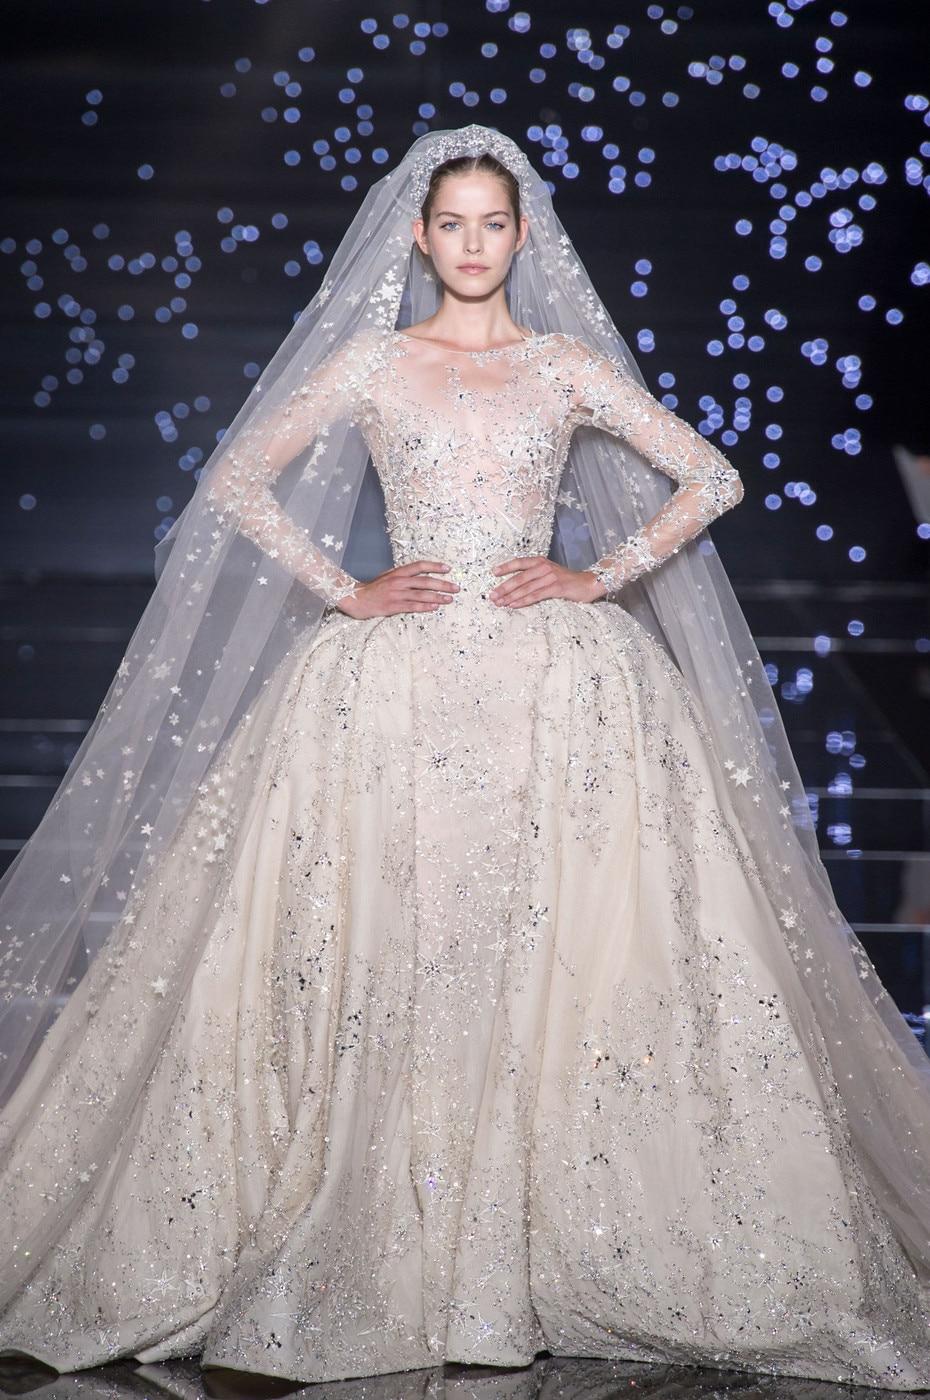 2017 Zuhair Murad Design Hot Luxury Beading Crystal Hign Quality Wedding Dress Veatidos De Novia Ms1012 21 In Dresses From Weddings Events On